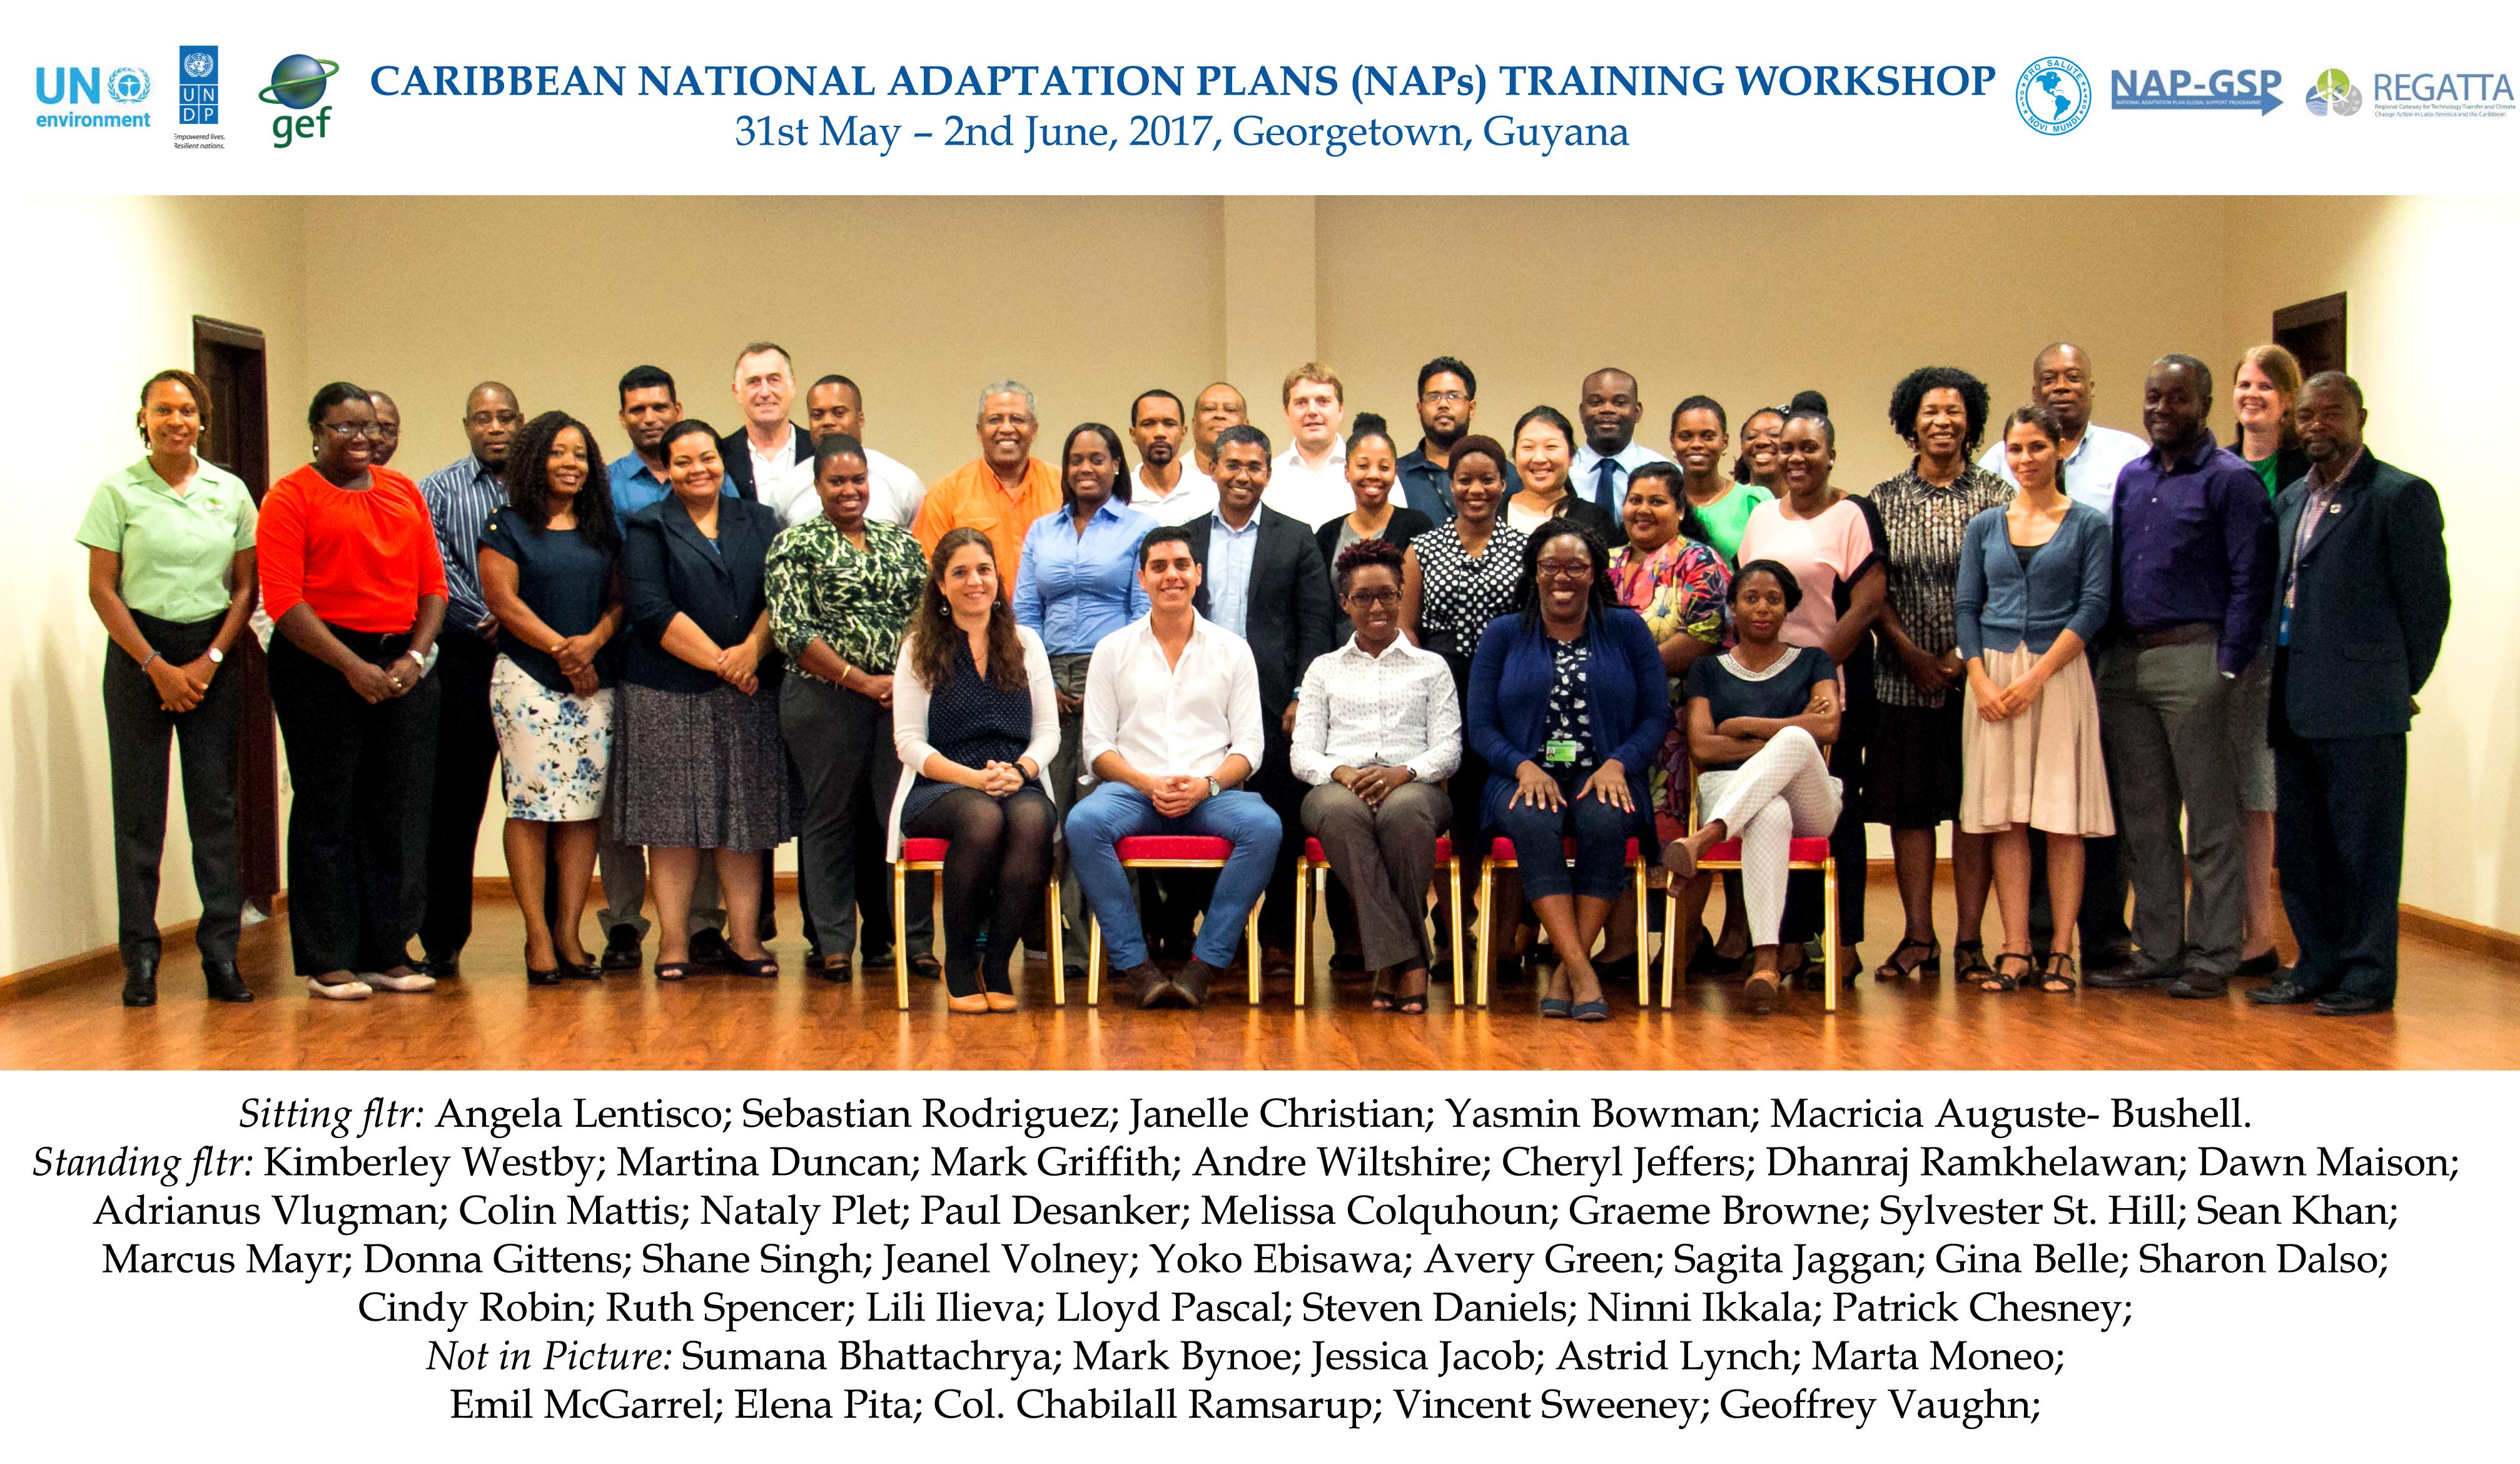 2017, Georgetown, Guyana- Caribbean NAP Training Workshop